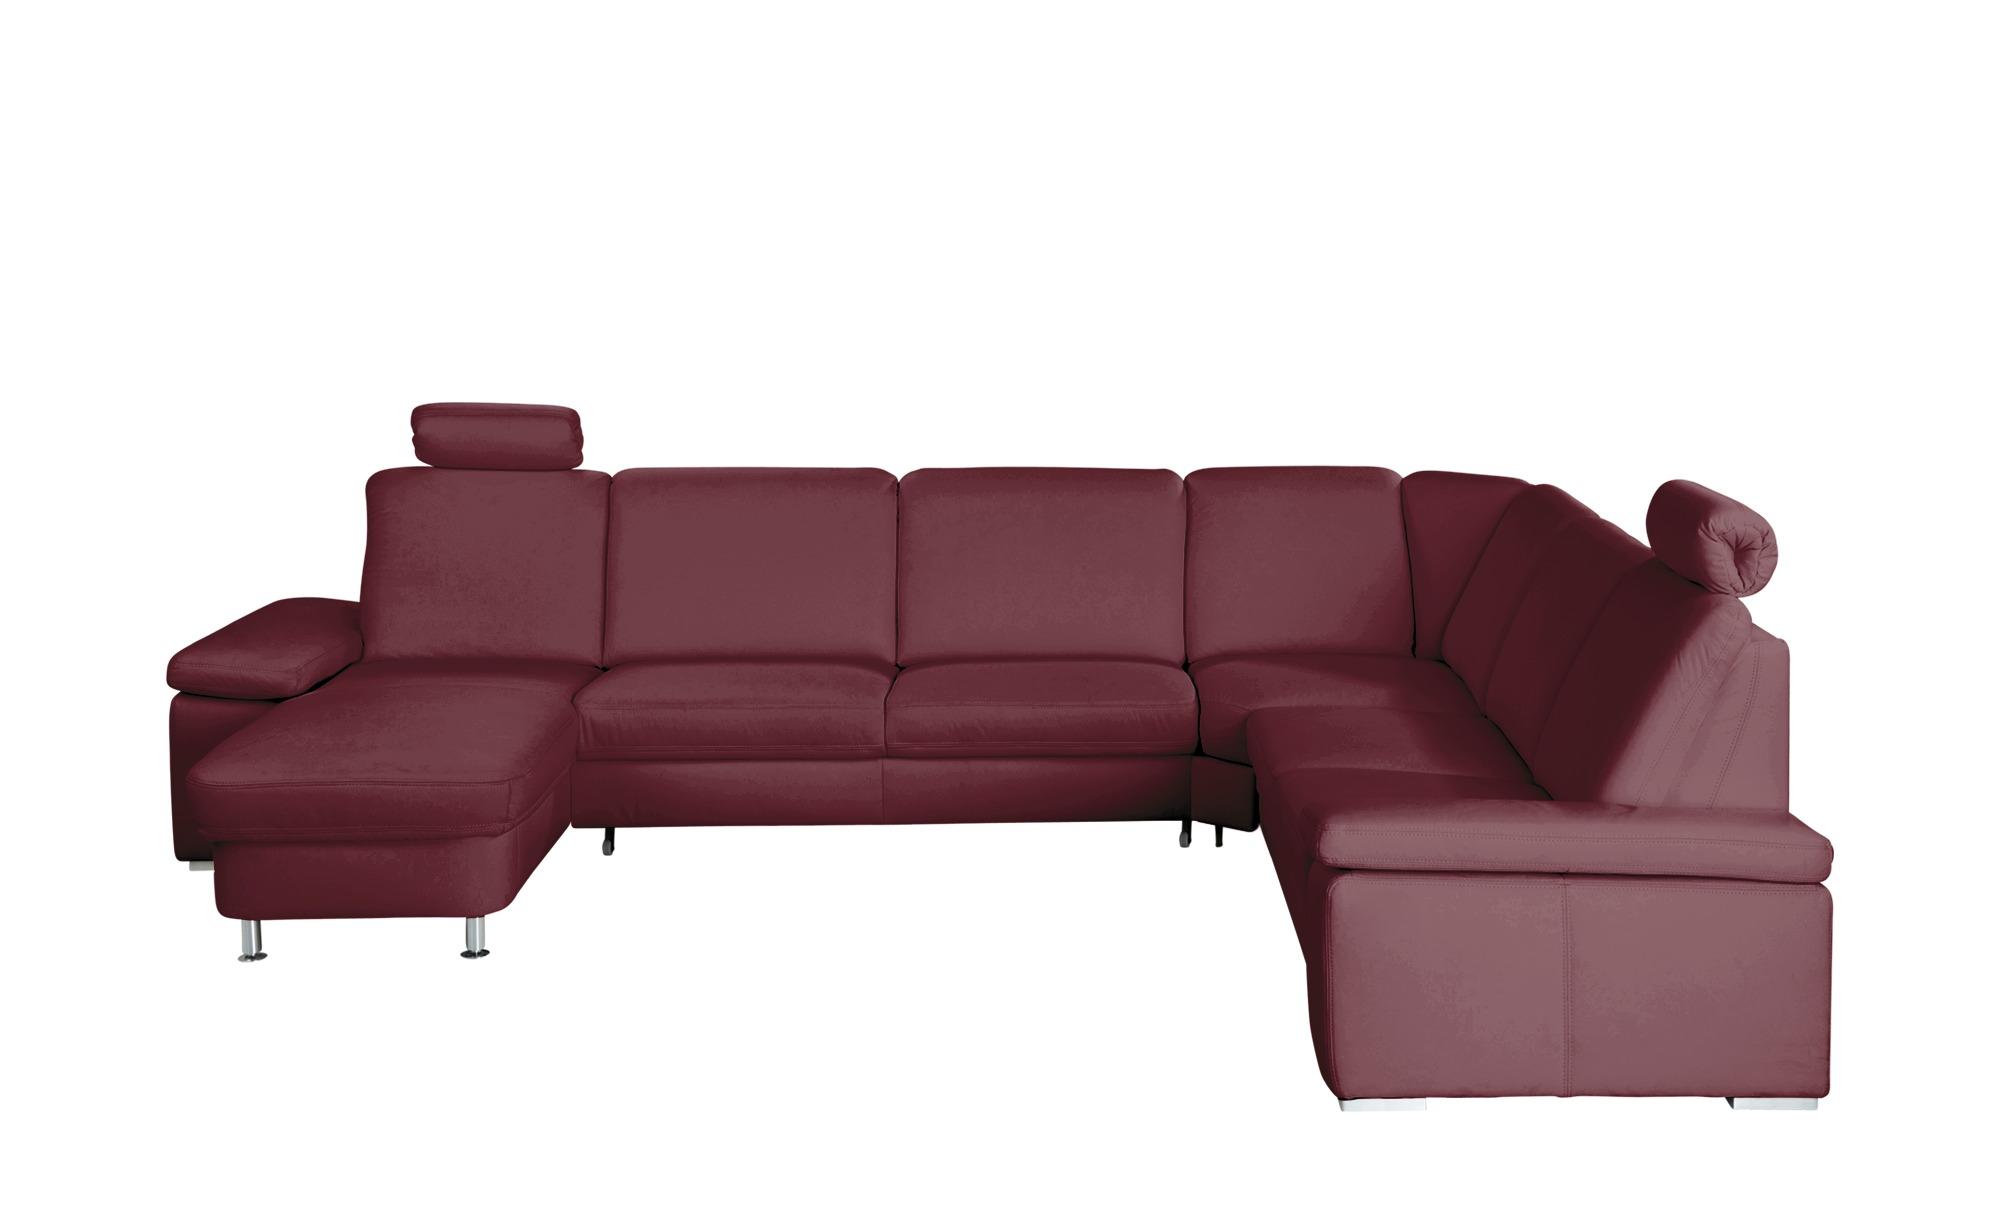 Meinsofa Wohnlandschaft Elsa Gefunden Bei Mobel Hoffner Wohnen Sofa Sofa Design